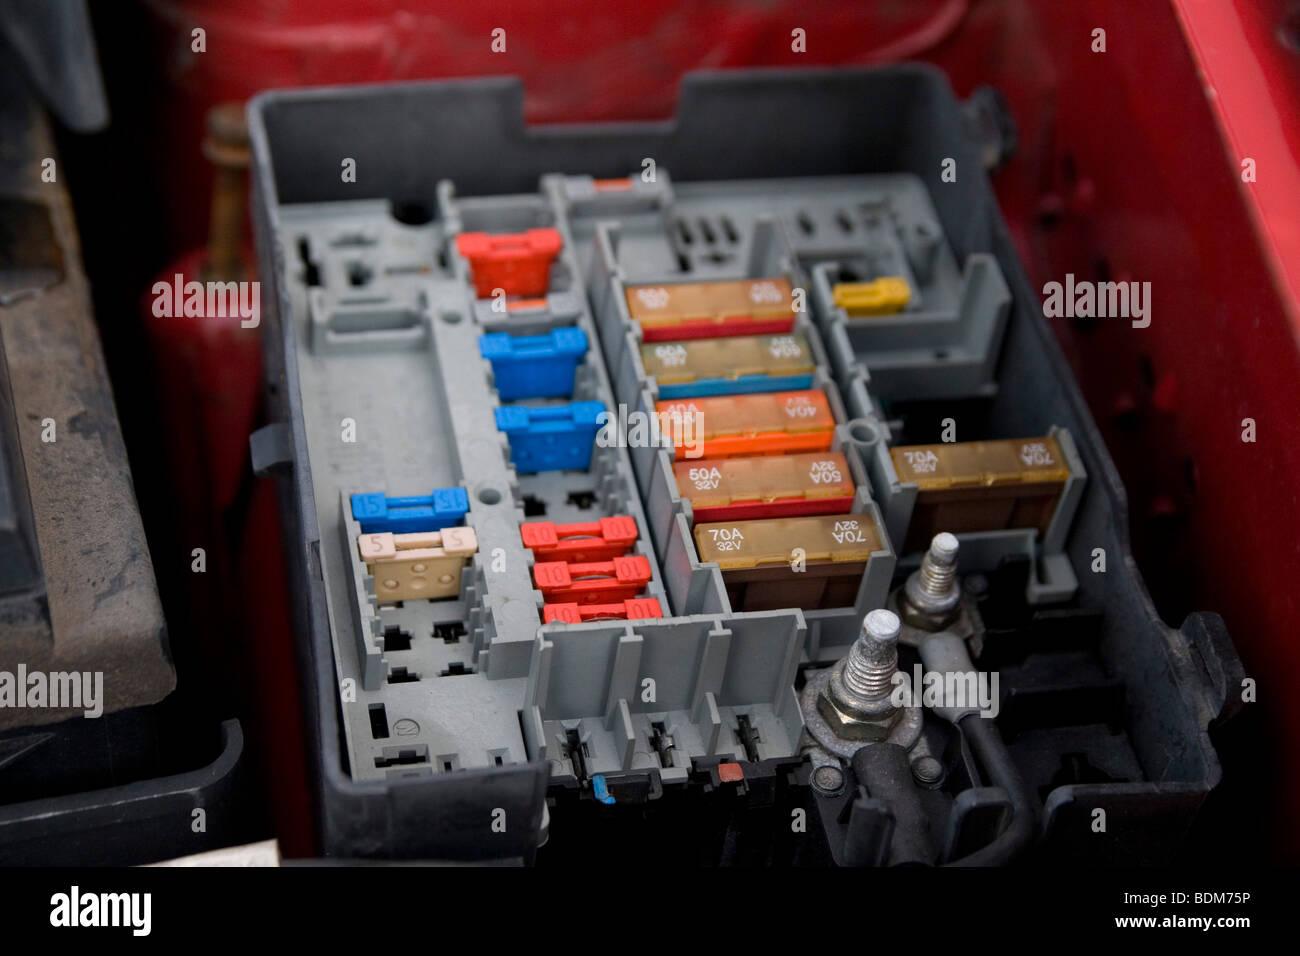 fuse box in citroen c1 schematic wiring diagram Ford Ka Interior